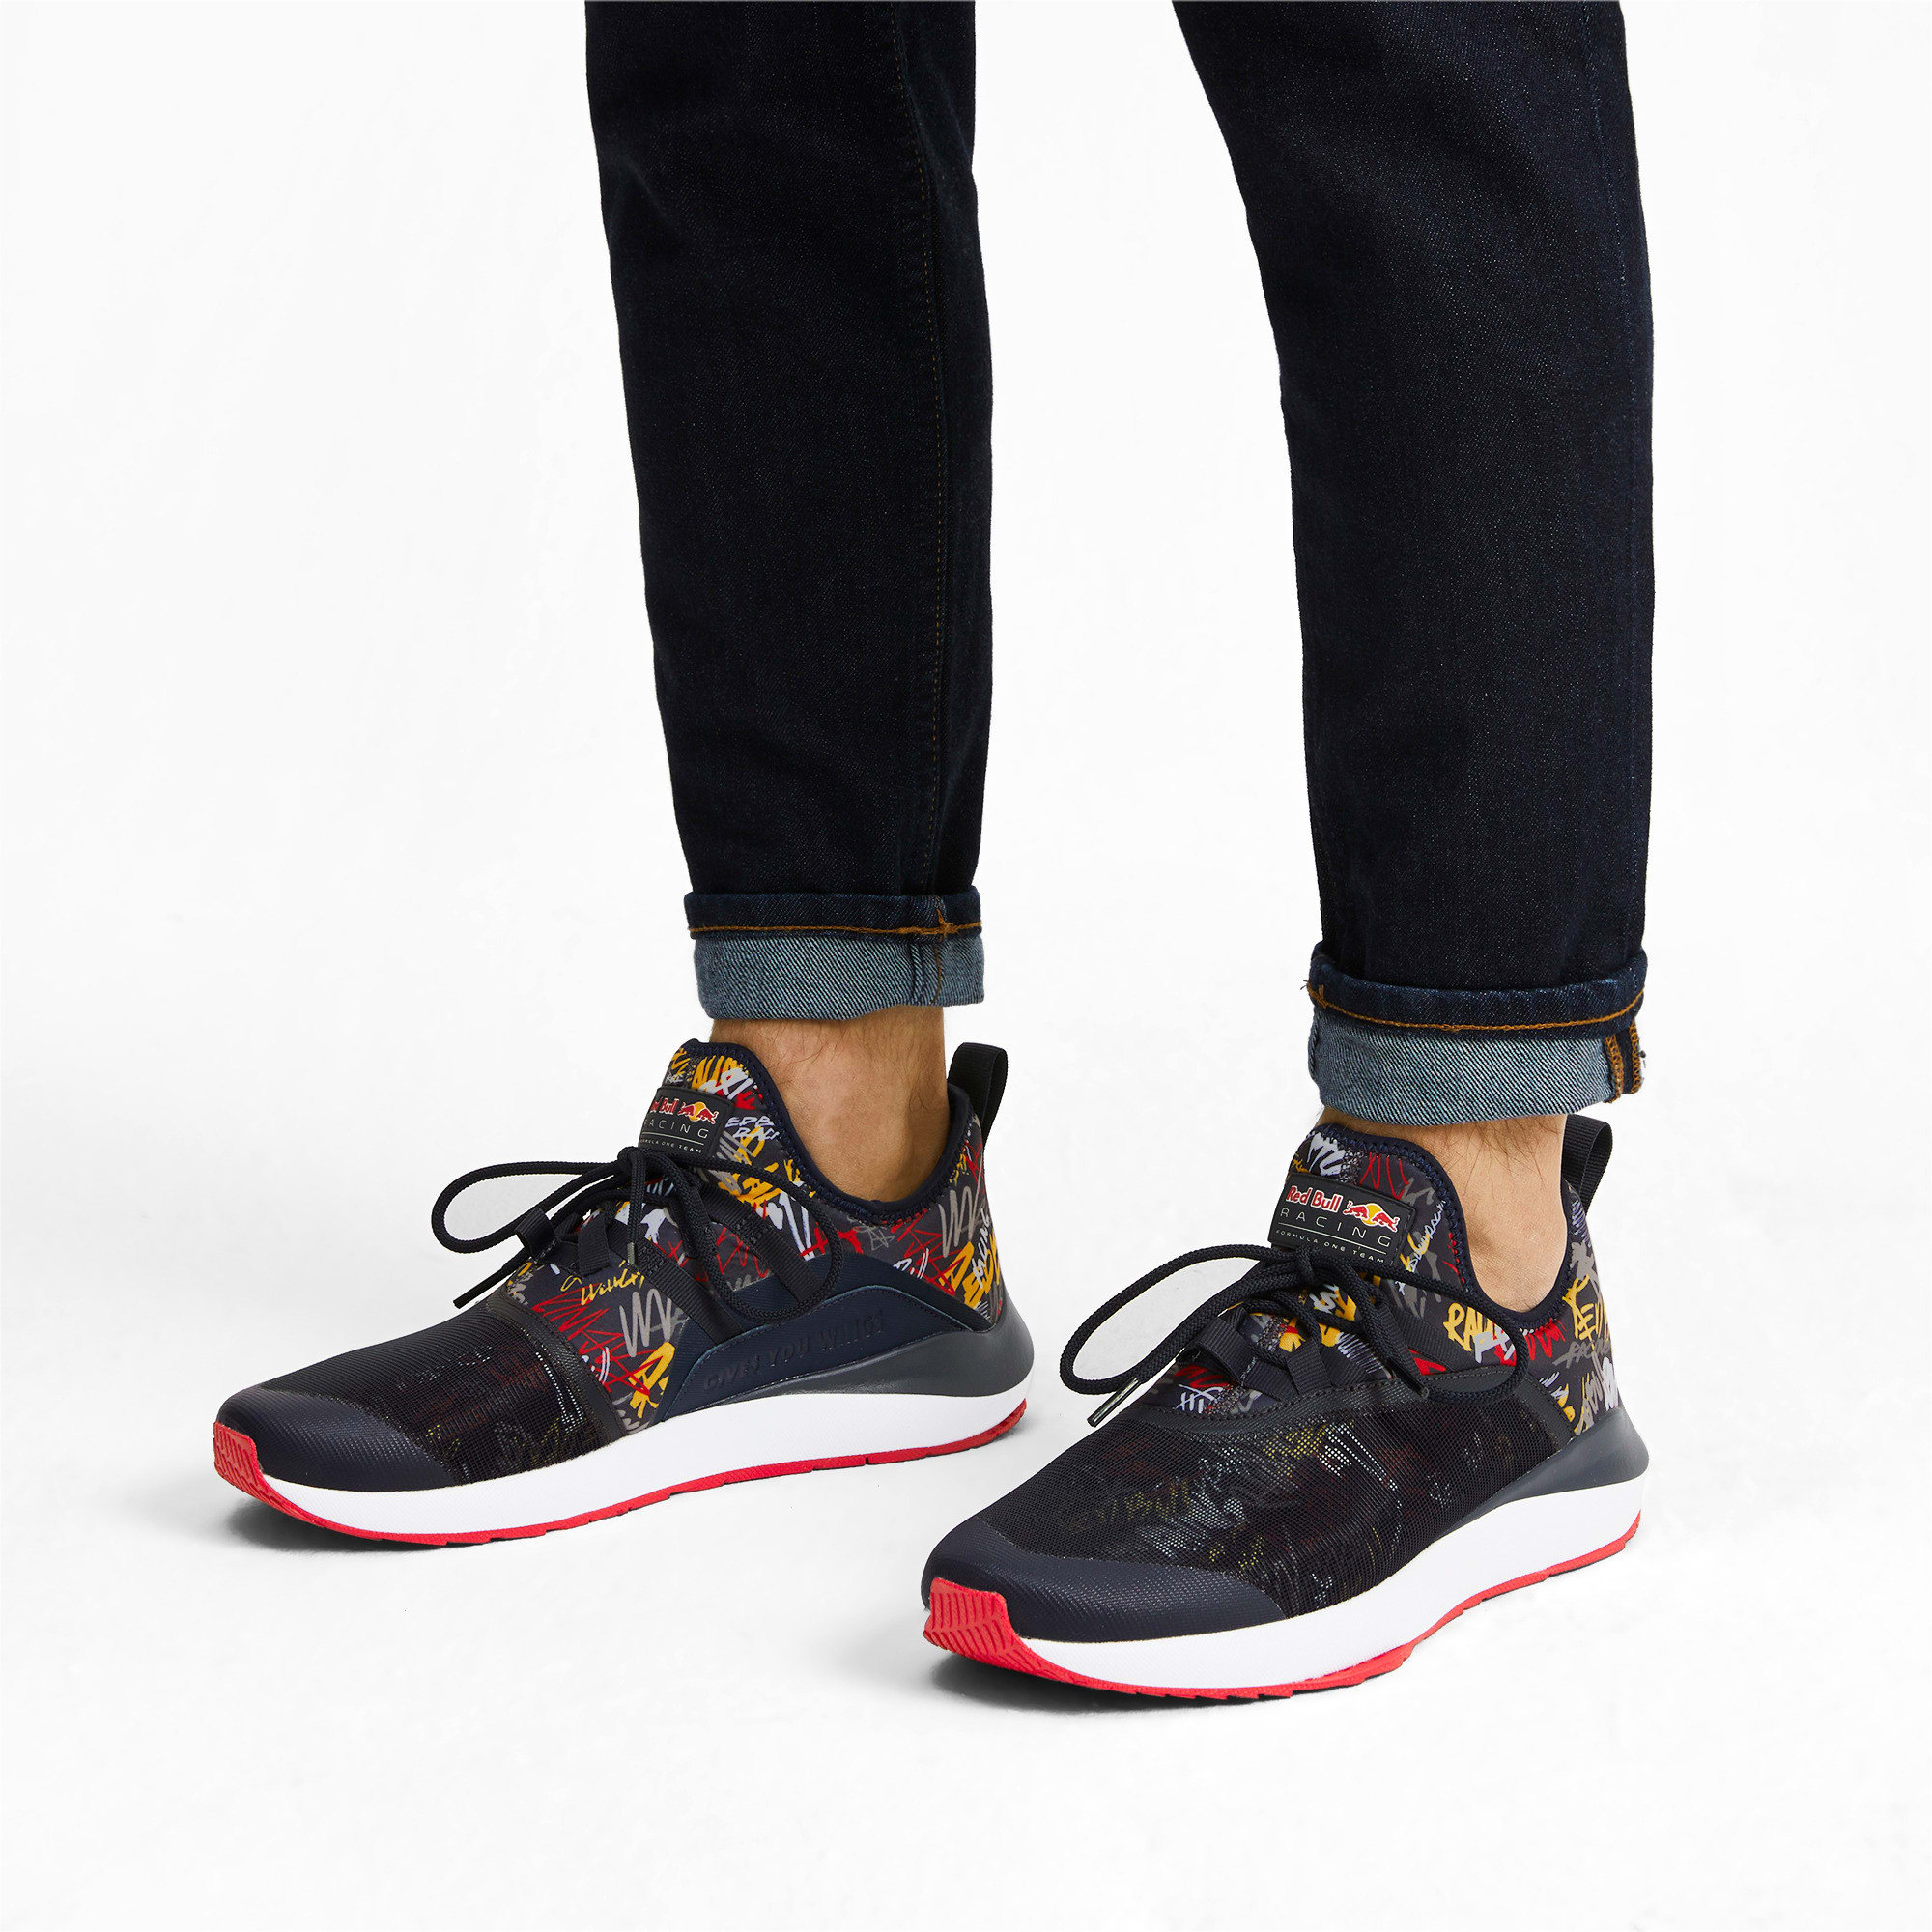 Thumbnail 3 of Red Bull Racing Evo Cat II Graphic Men's Training Shoes, NIGHT SKY-White-Chinese Red, medium